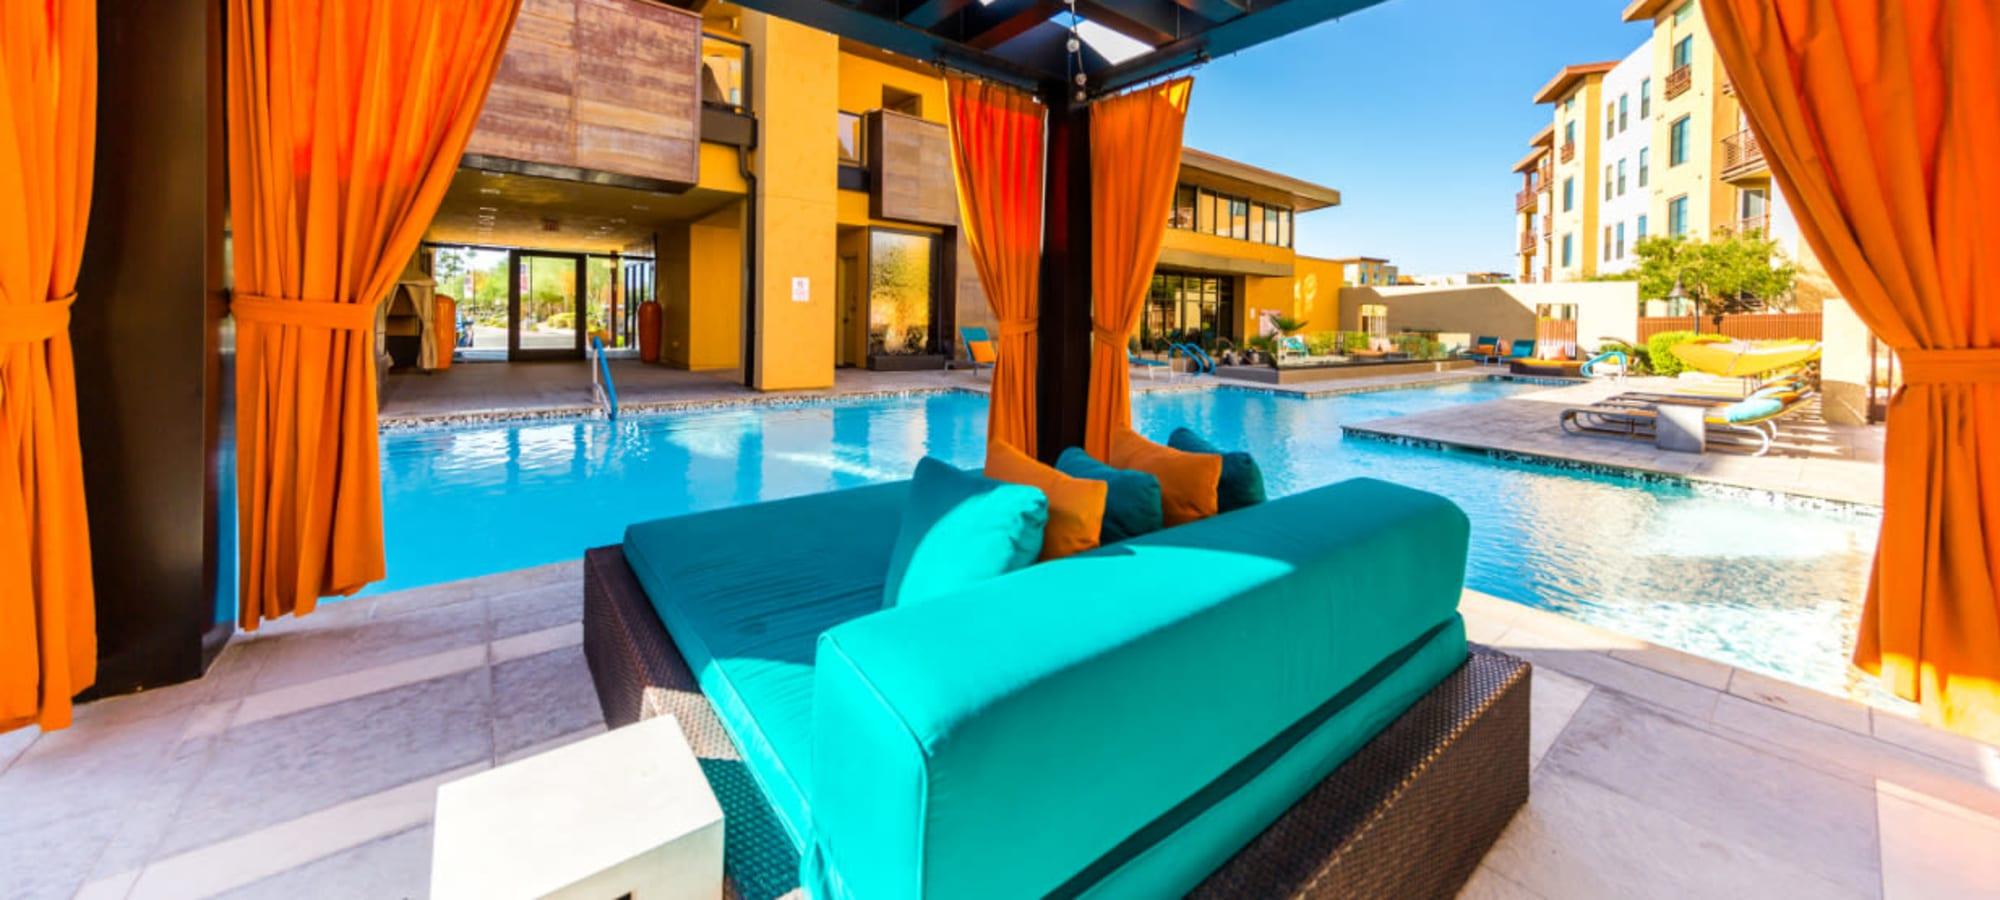 Apply to live at Marquis at Desert Ridge in Phoenix, Arizona